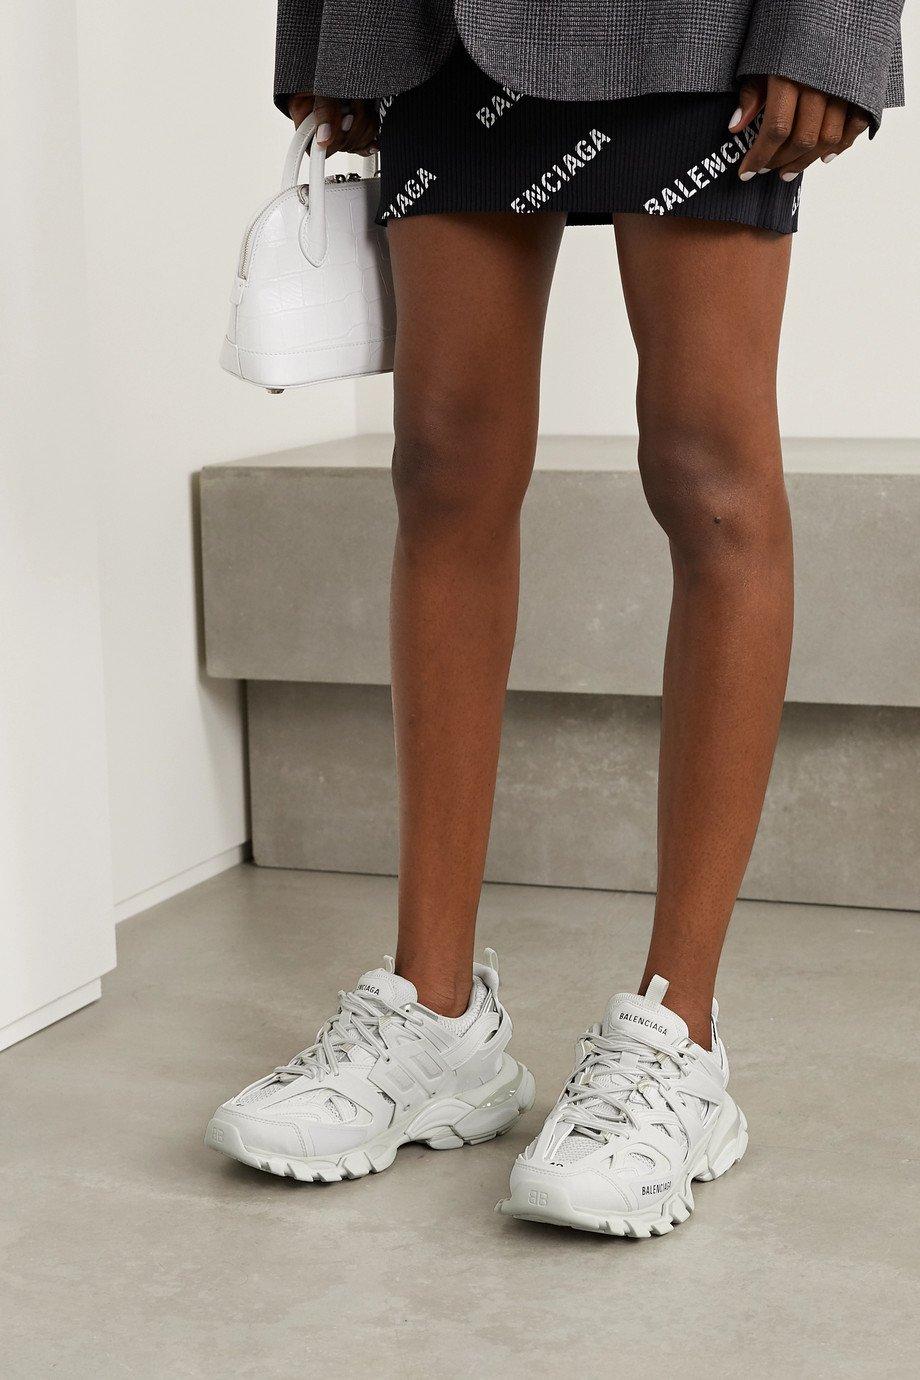 Balenciaga sneakers white